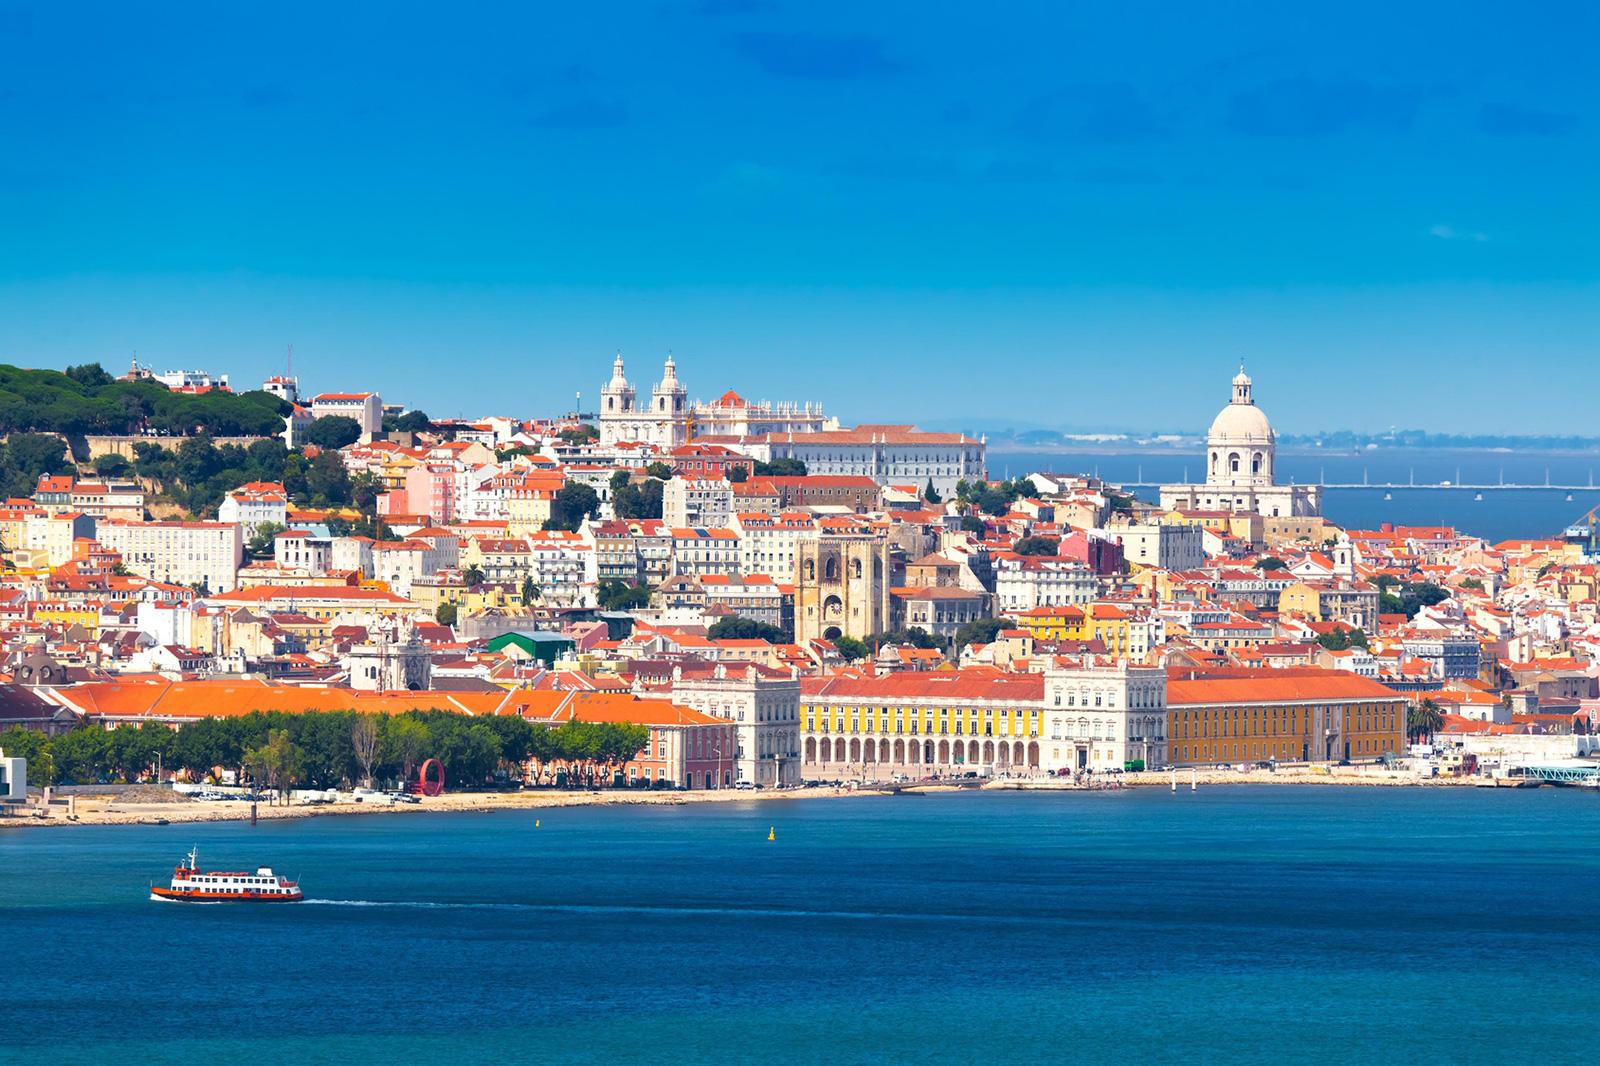 Portugal - Lisbonne capitale verte européenne 2020